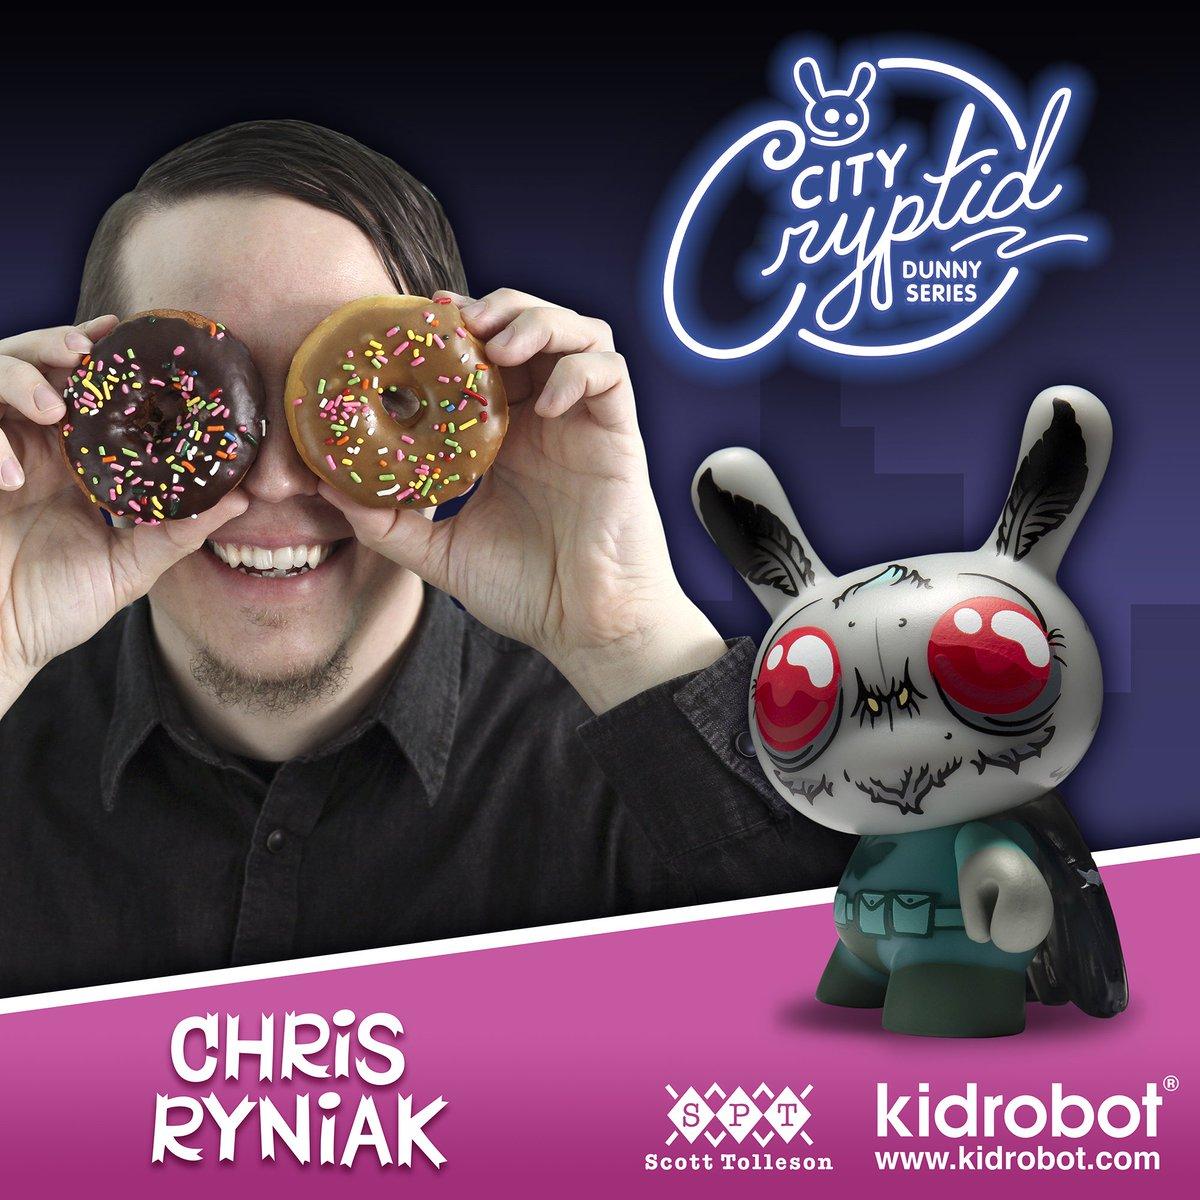 "Kidrobot-City Cryptid Series 2018 ""Mothman"" by Chris Ryniak"